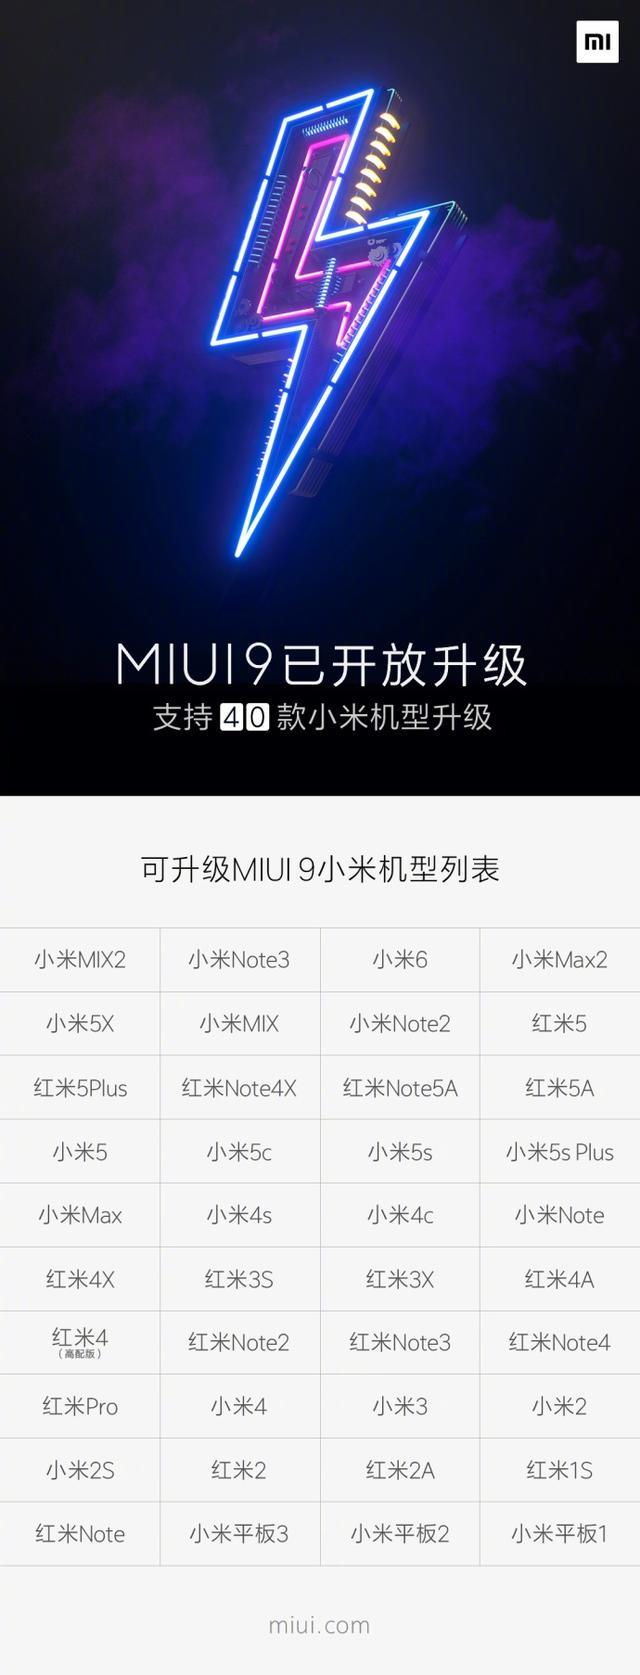 miui9更新最新版